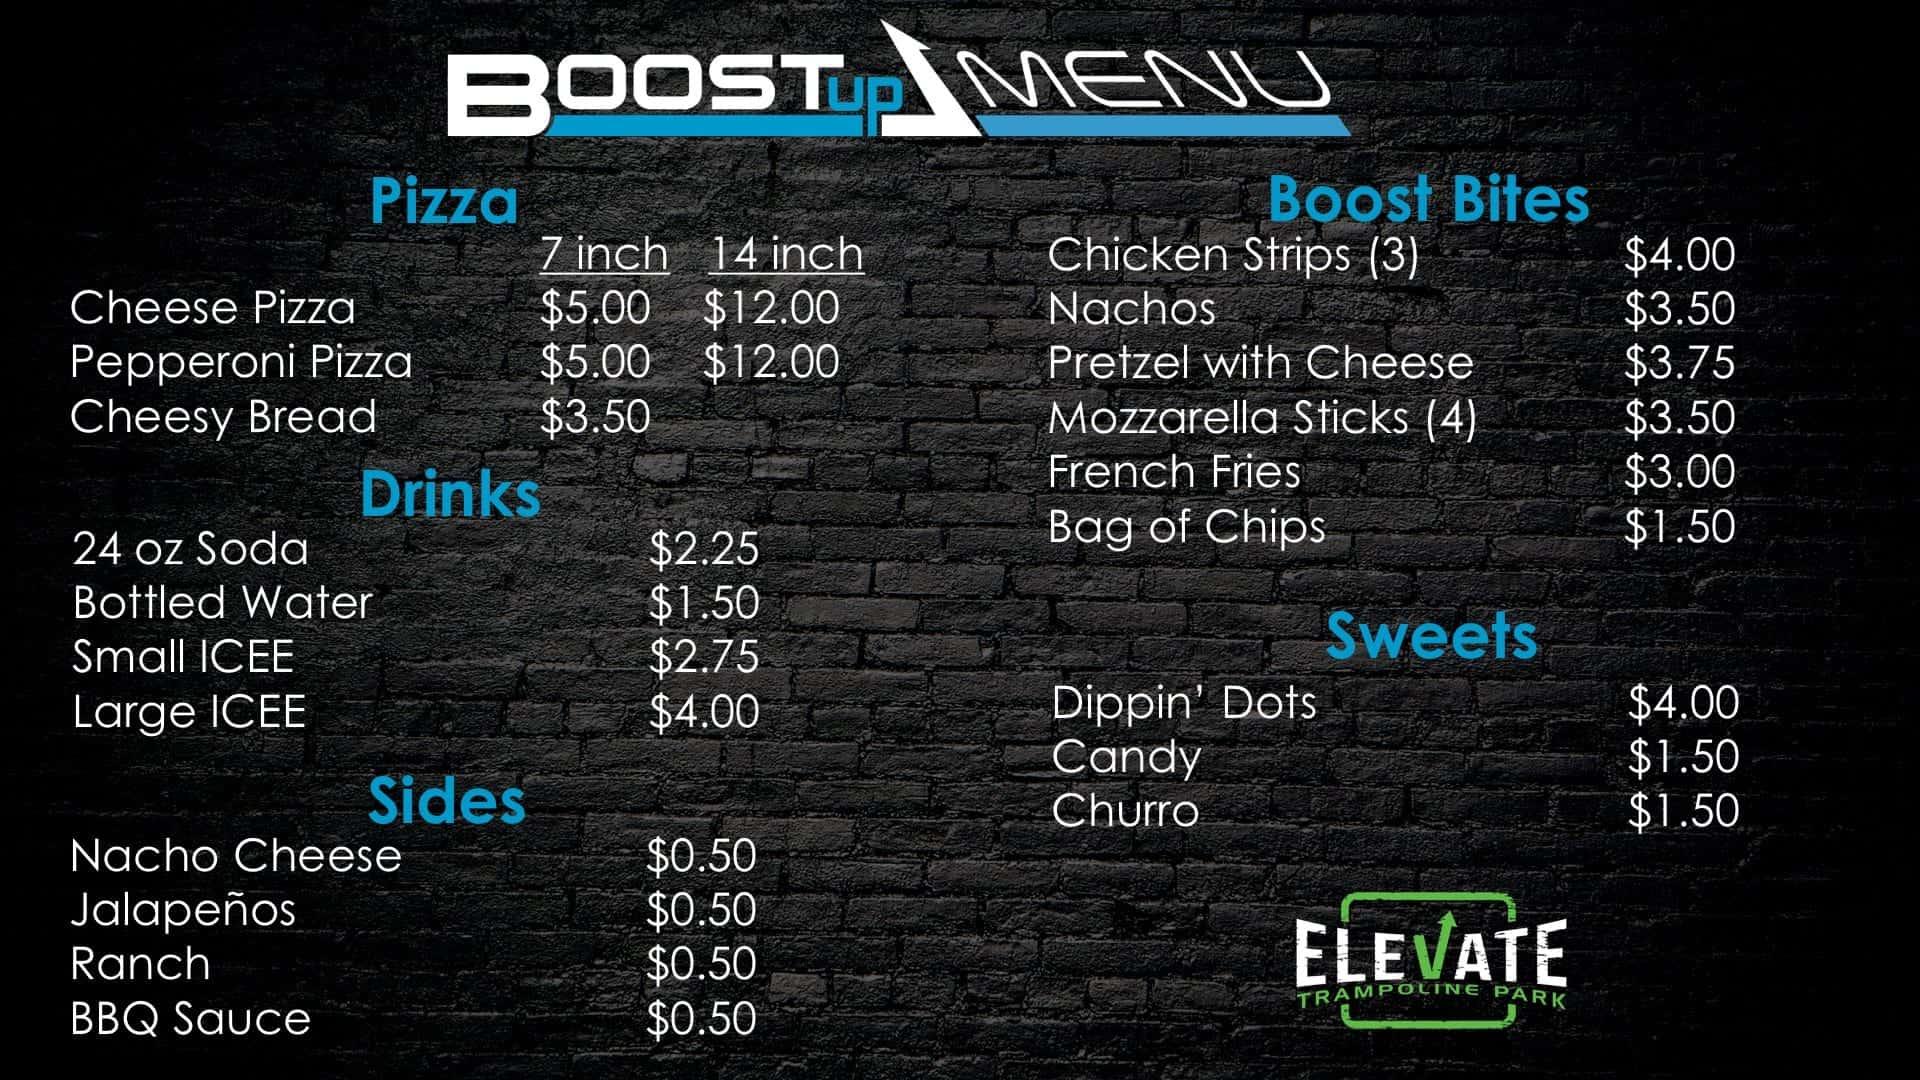 EV8 Goodyear Pricing Menu - Boost Up - 2.28.18